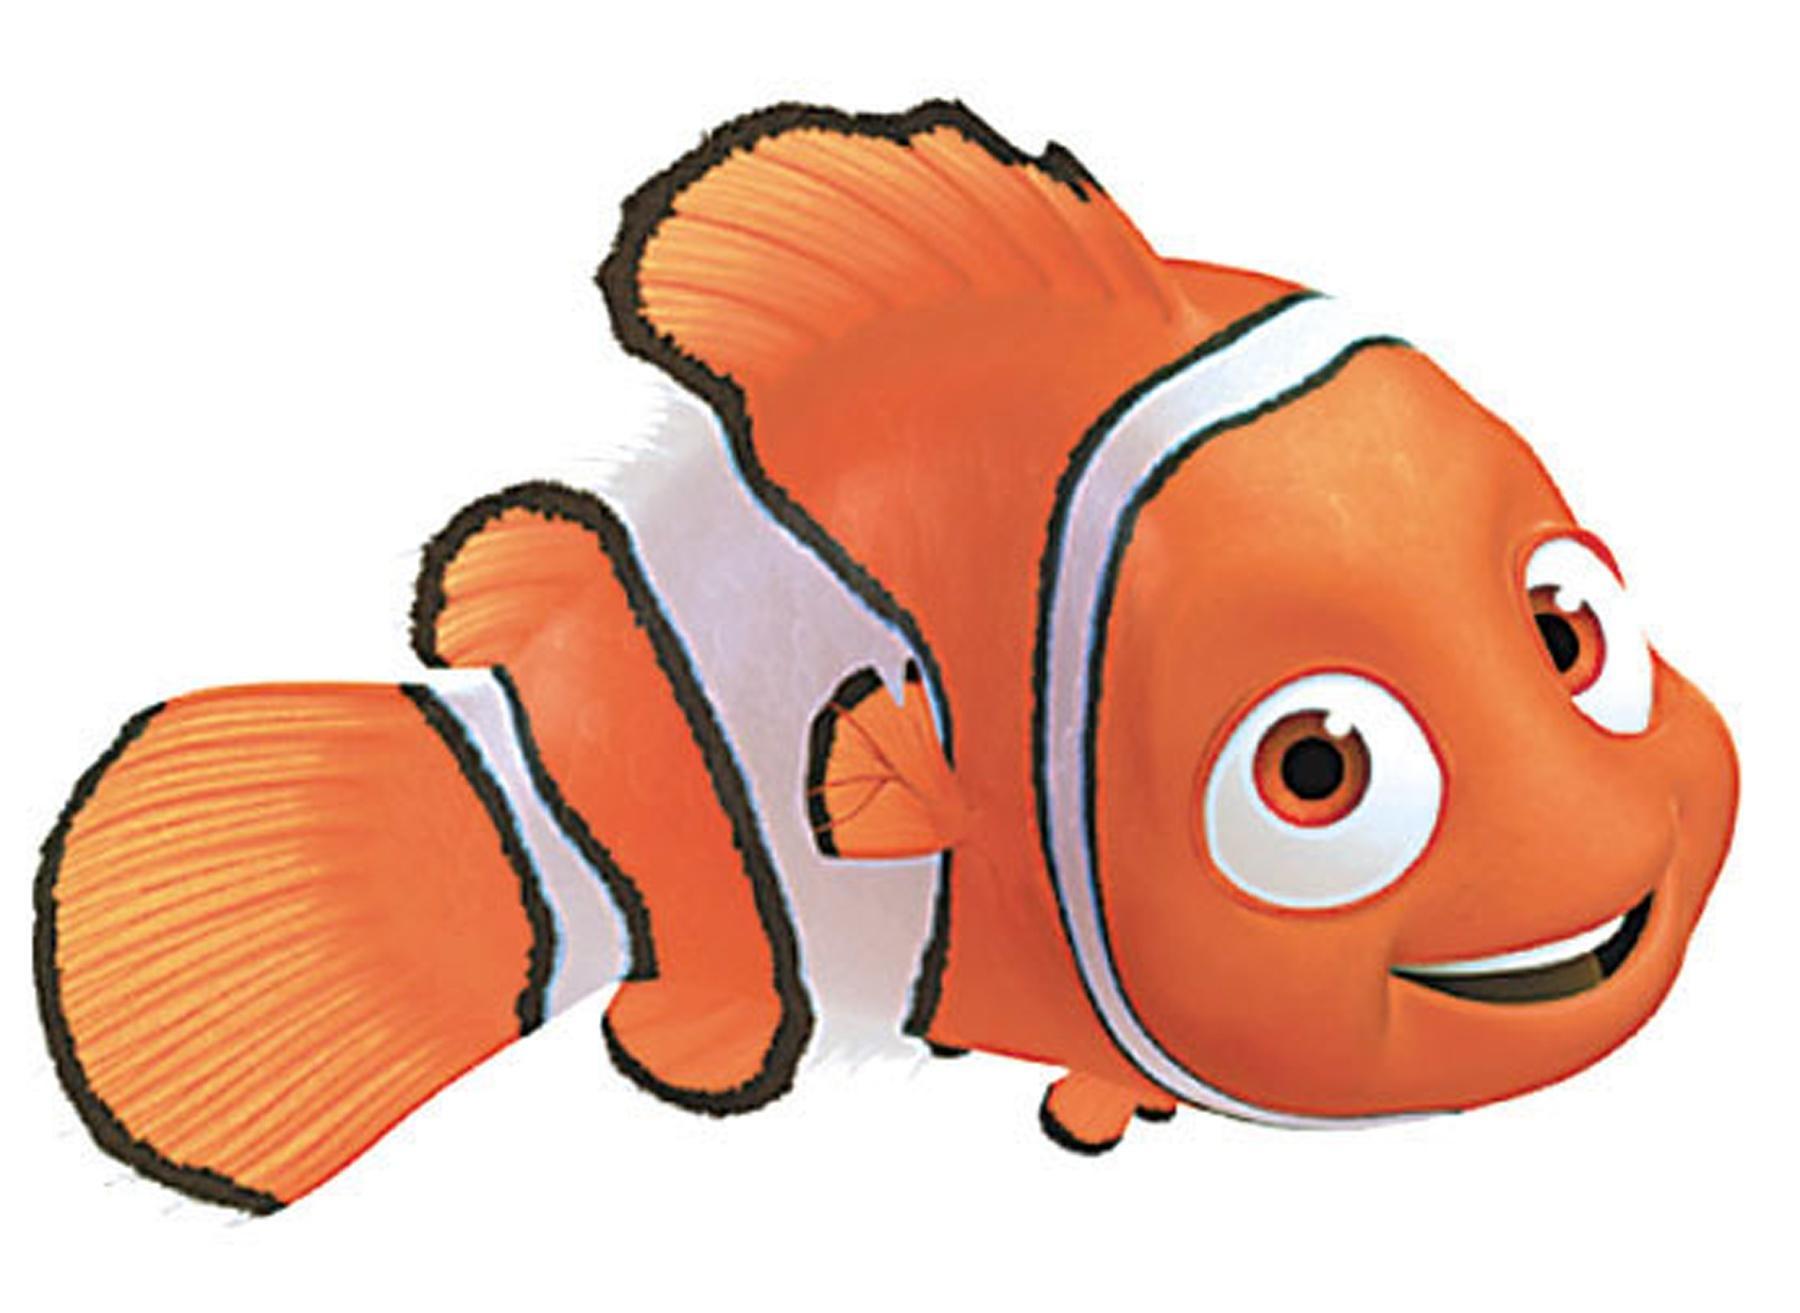 Nemo Clipart & Nemo Clip Art Images.